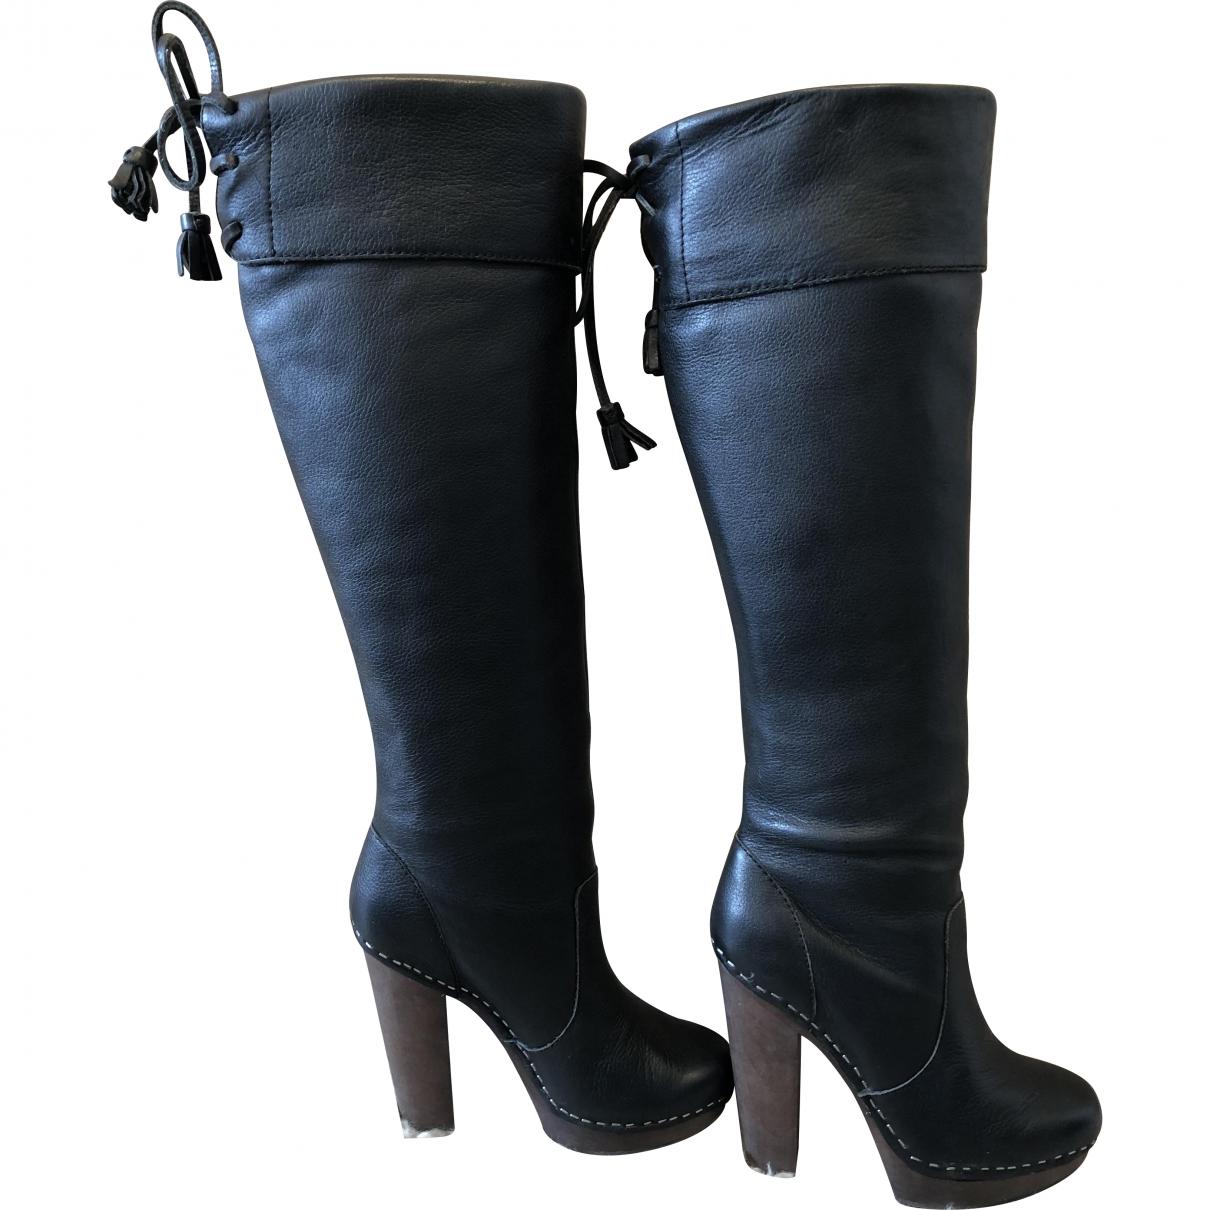 Steve Madden \N Black Leather Boots for Women 6 US